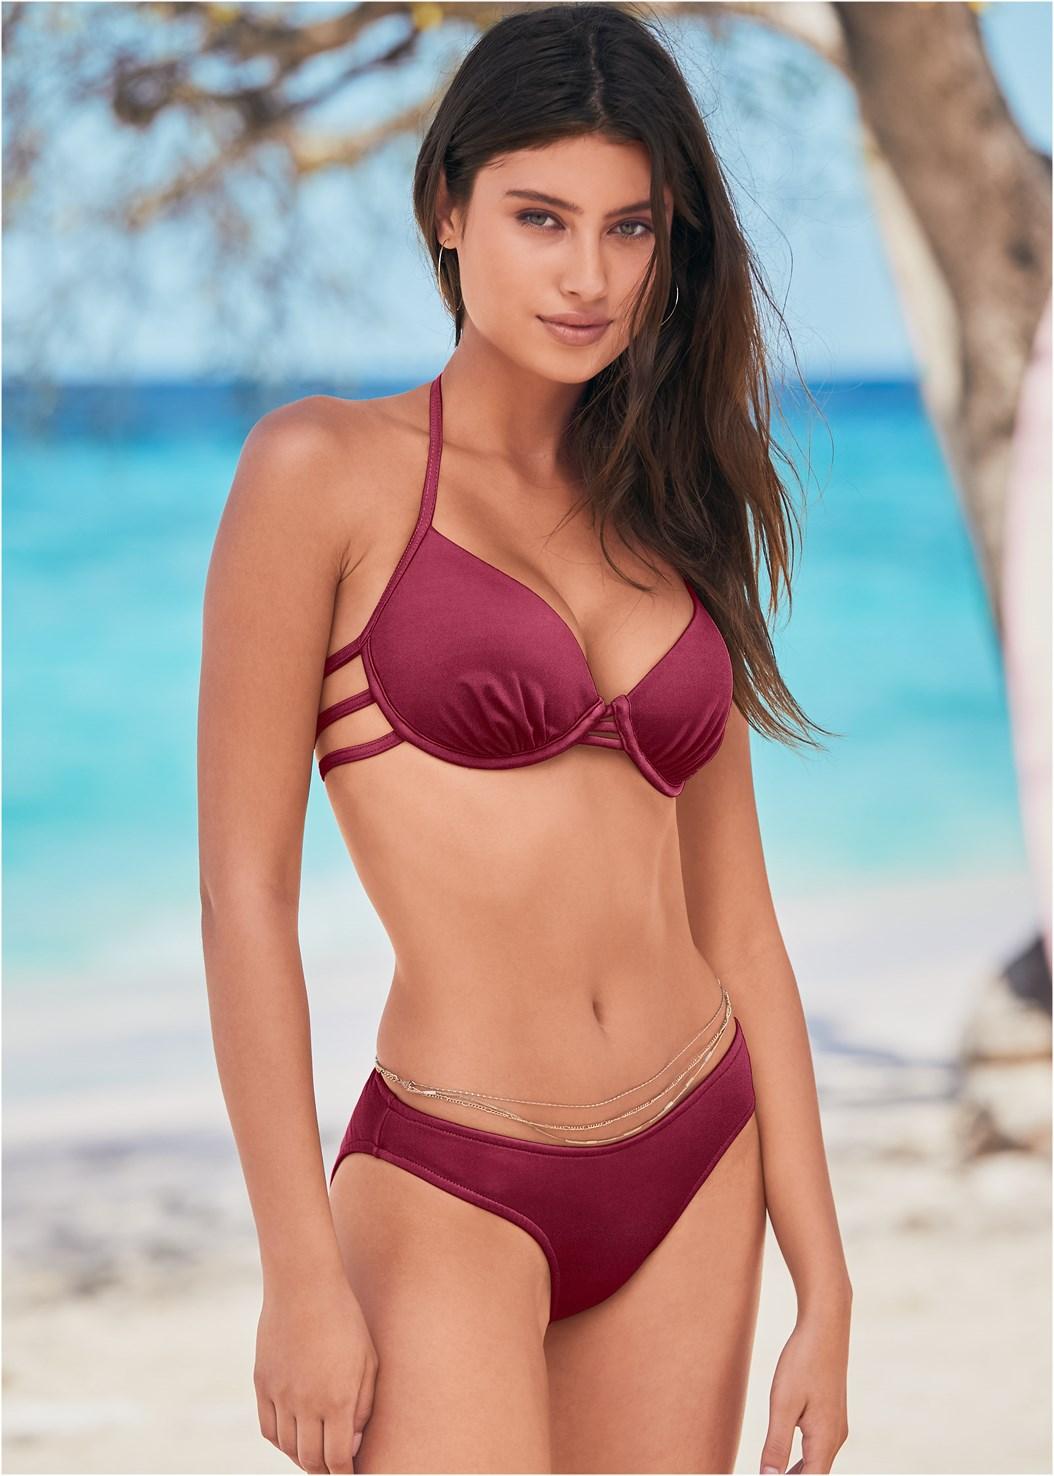 Strappy Enhancer Halter Top,Scoop Front Classic Bikini Bottom ,Low Rise Classic Bikini Bottom ,Wrapped Mid Rise Bottom,Jersey Fishnet Cover-Up Jumpsuit